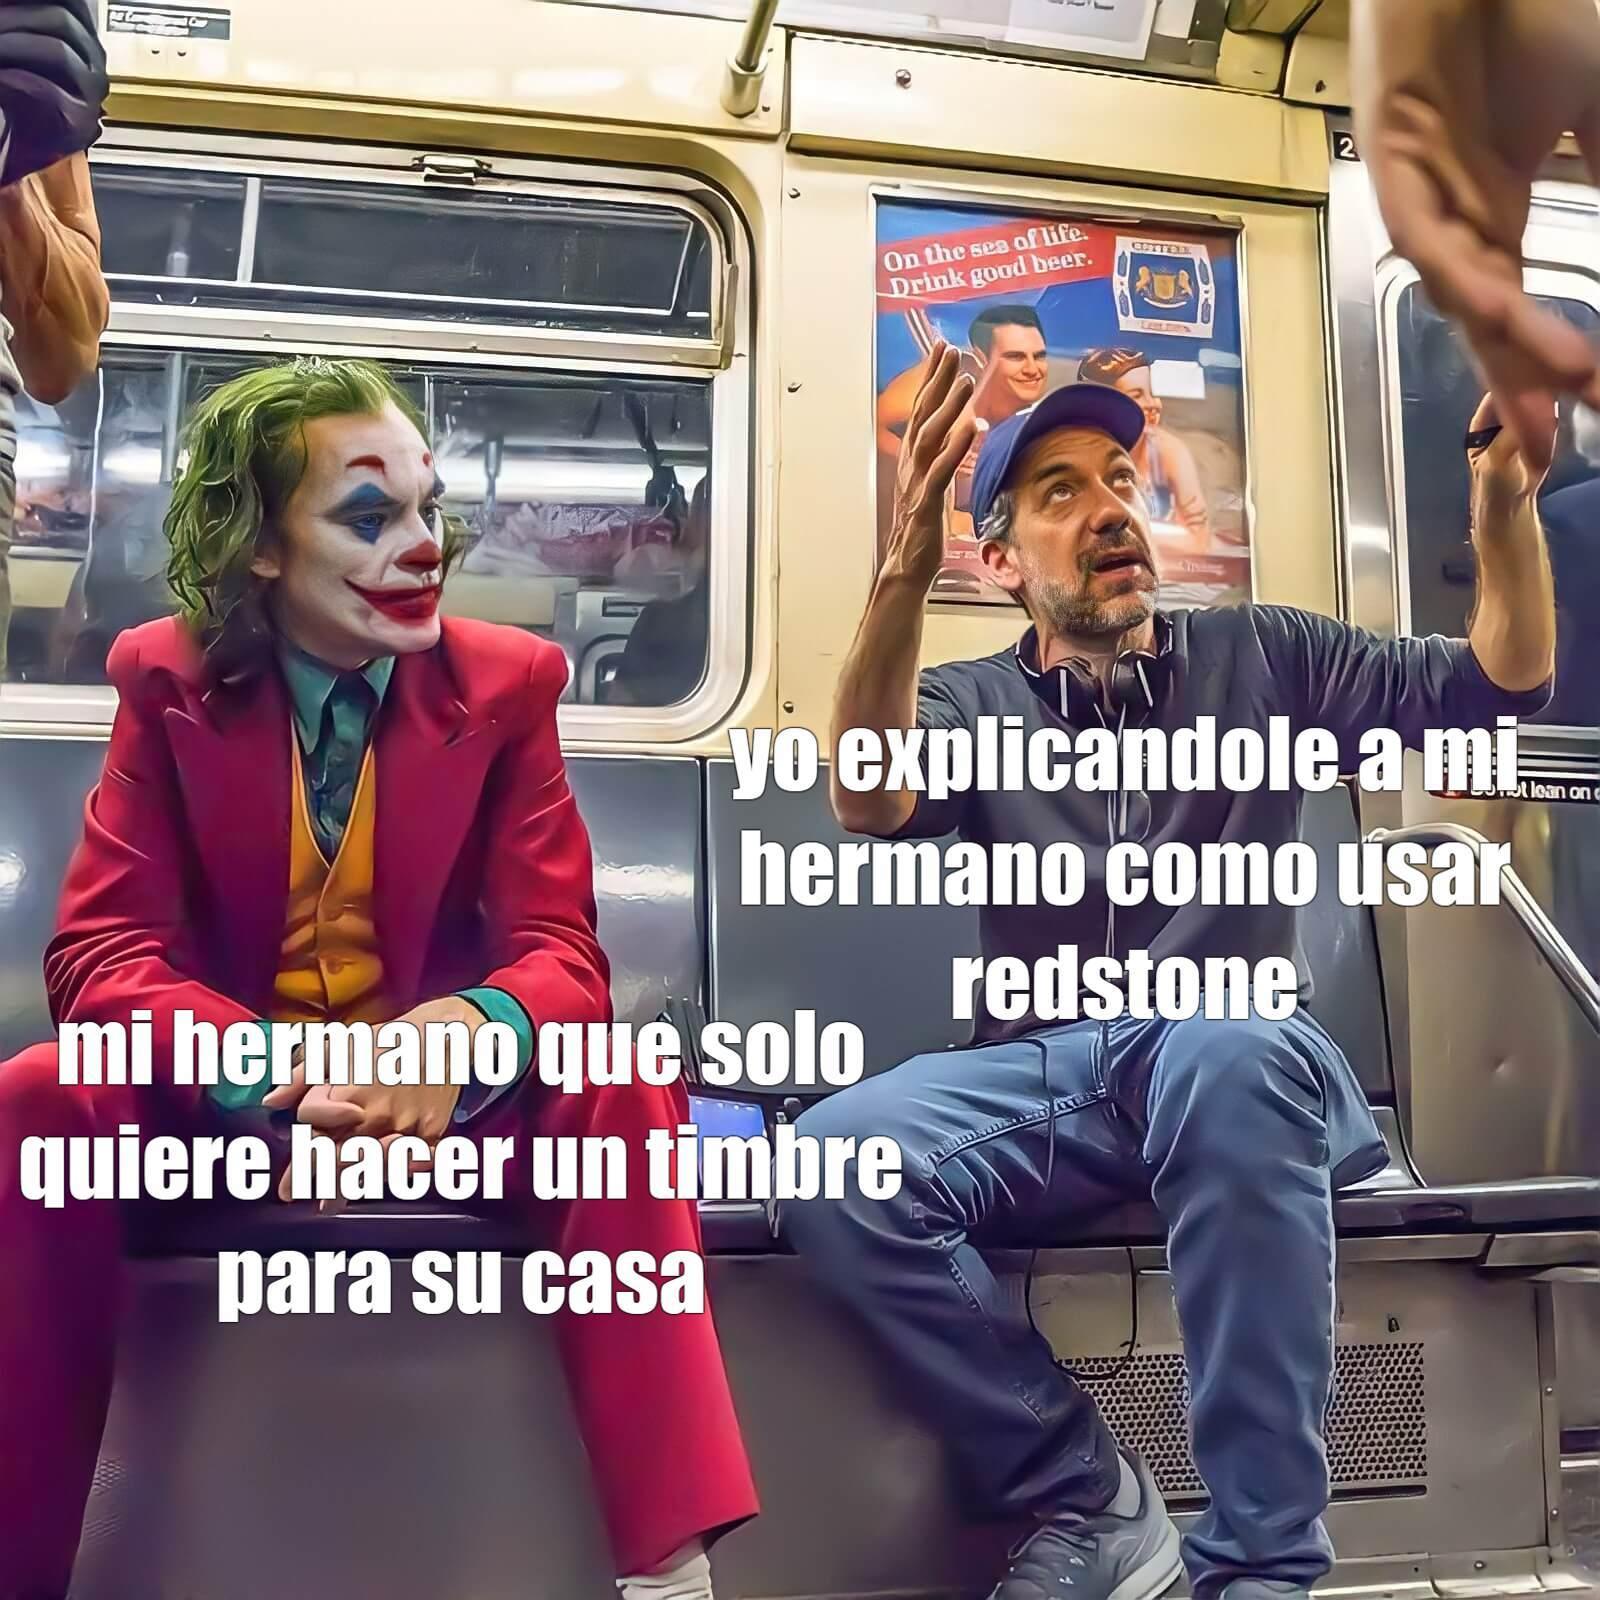 el joker - meme